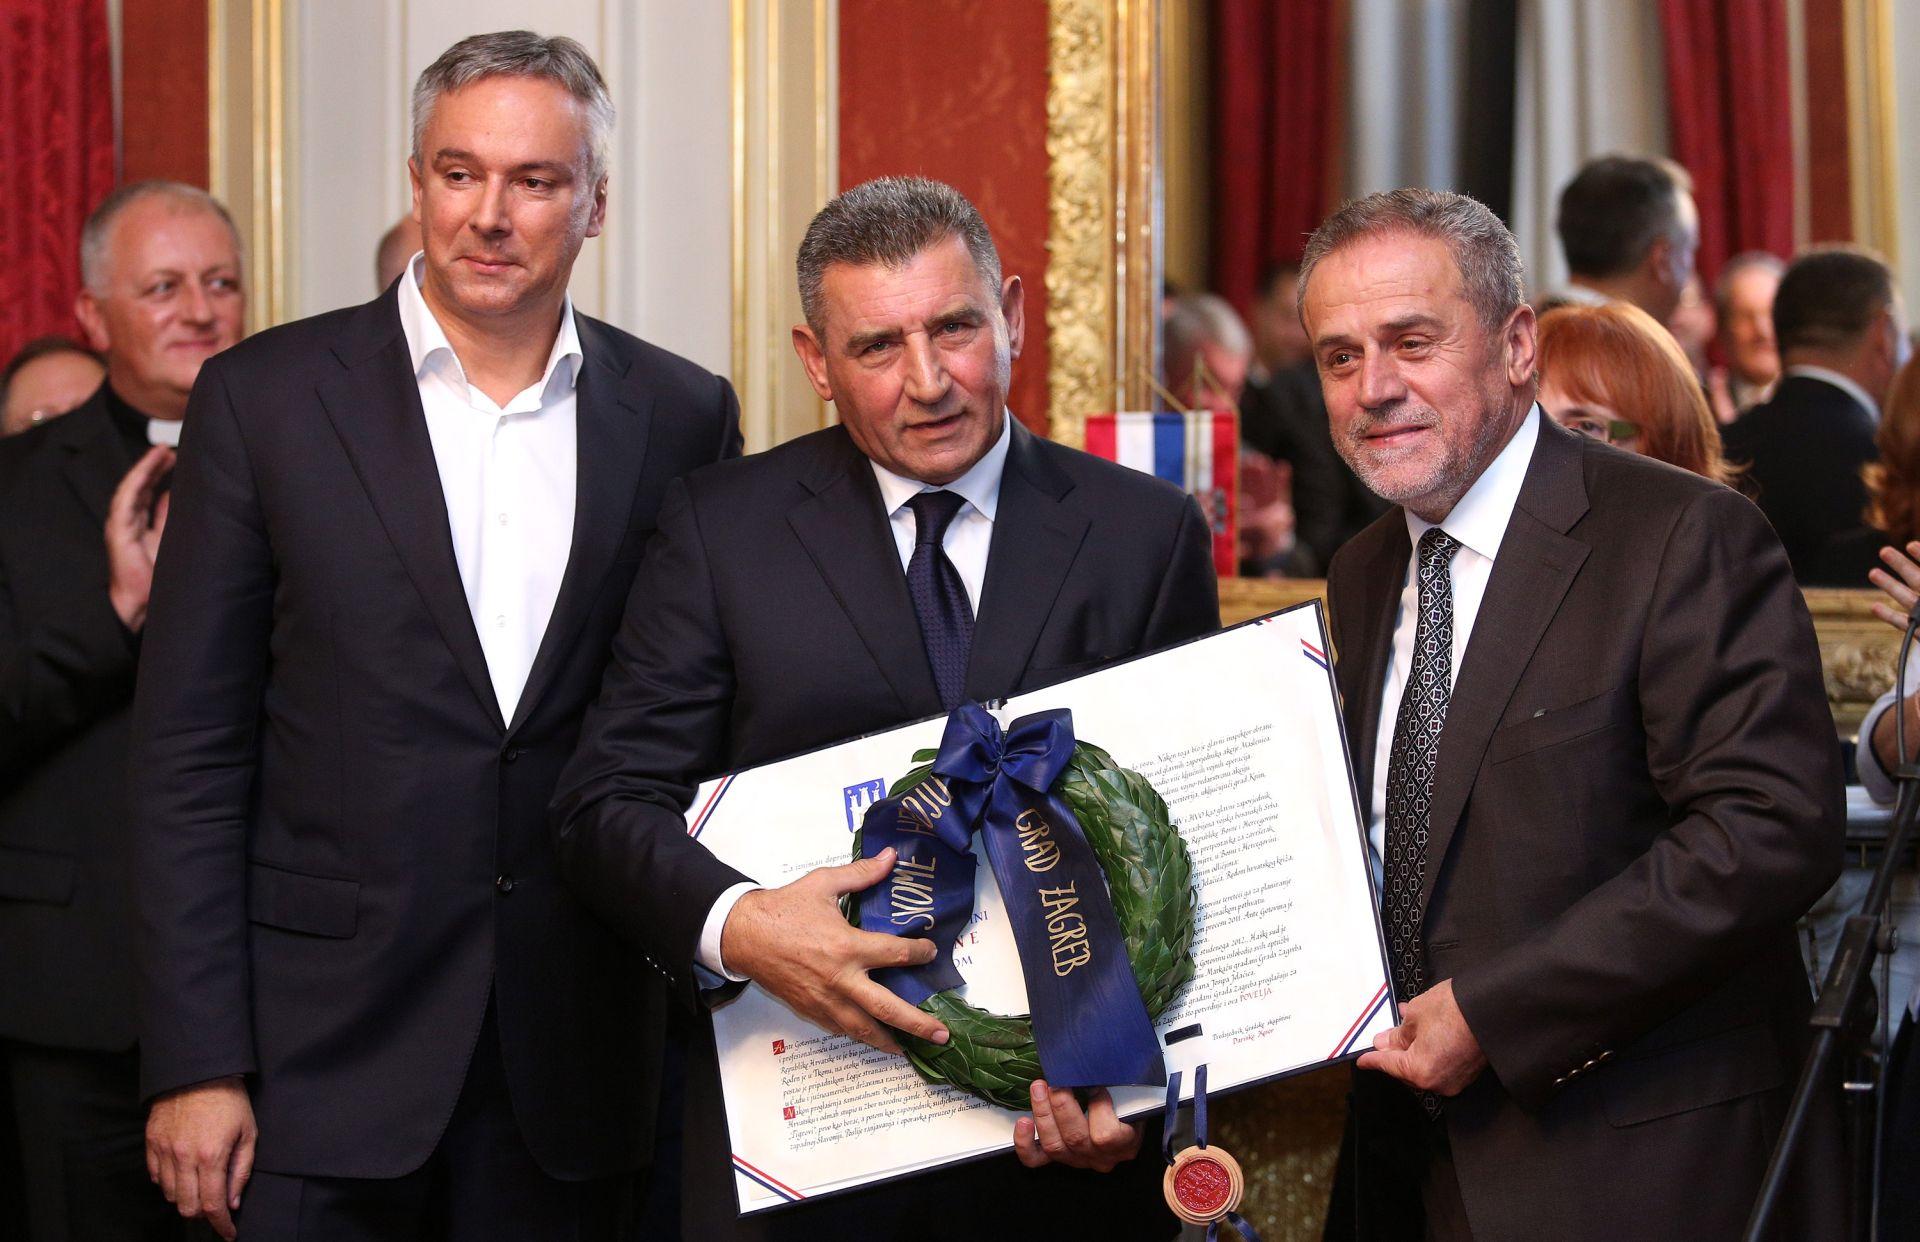 FOTO: Anti Gotovini svečano uručena Povelja počasnog građanina Zagreba